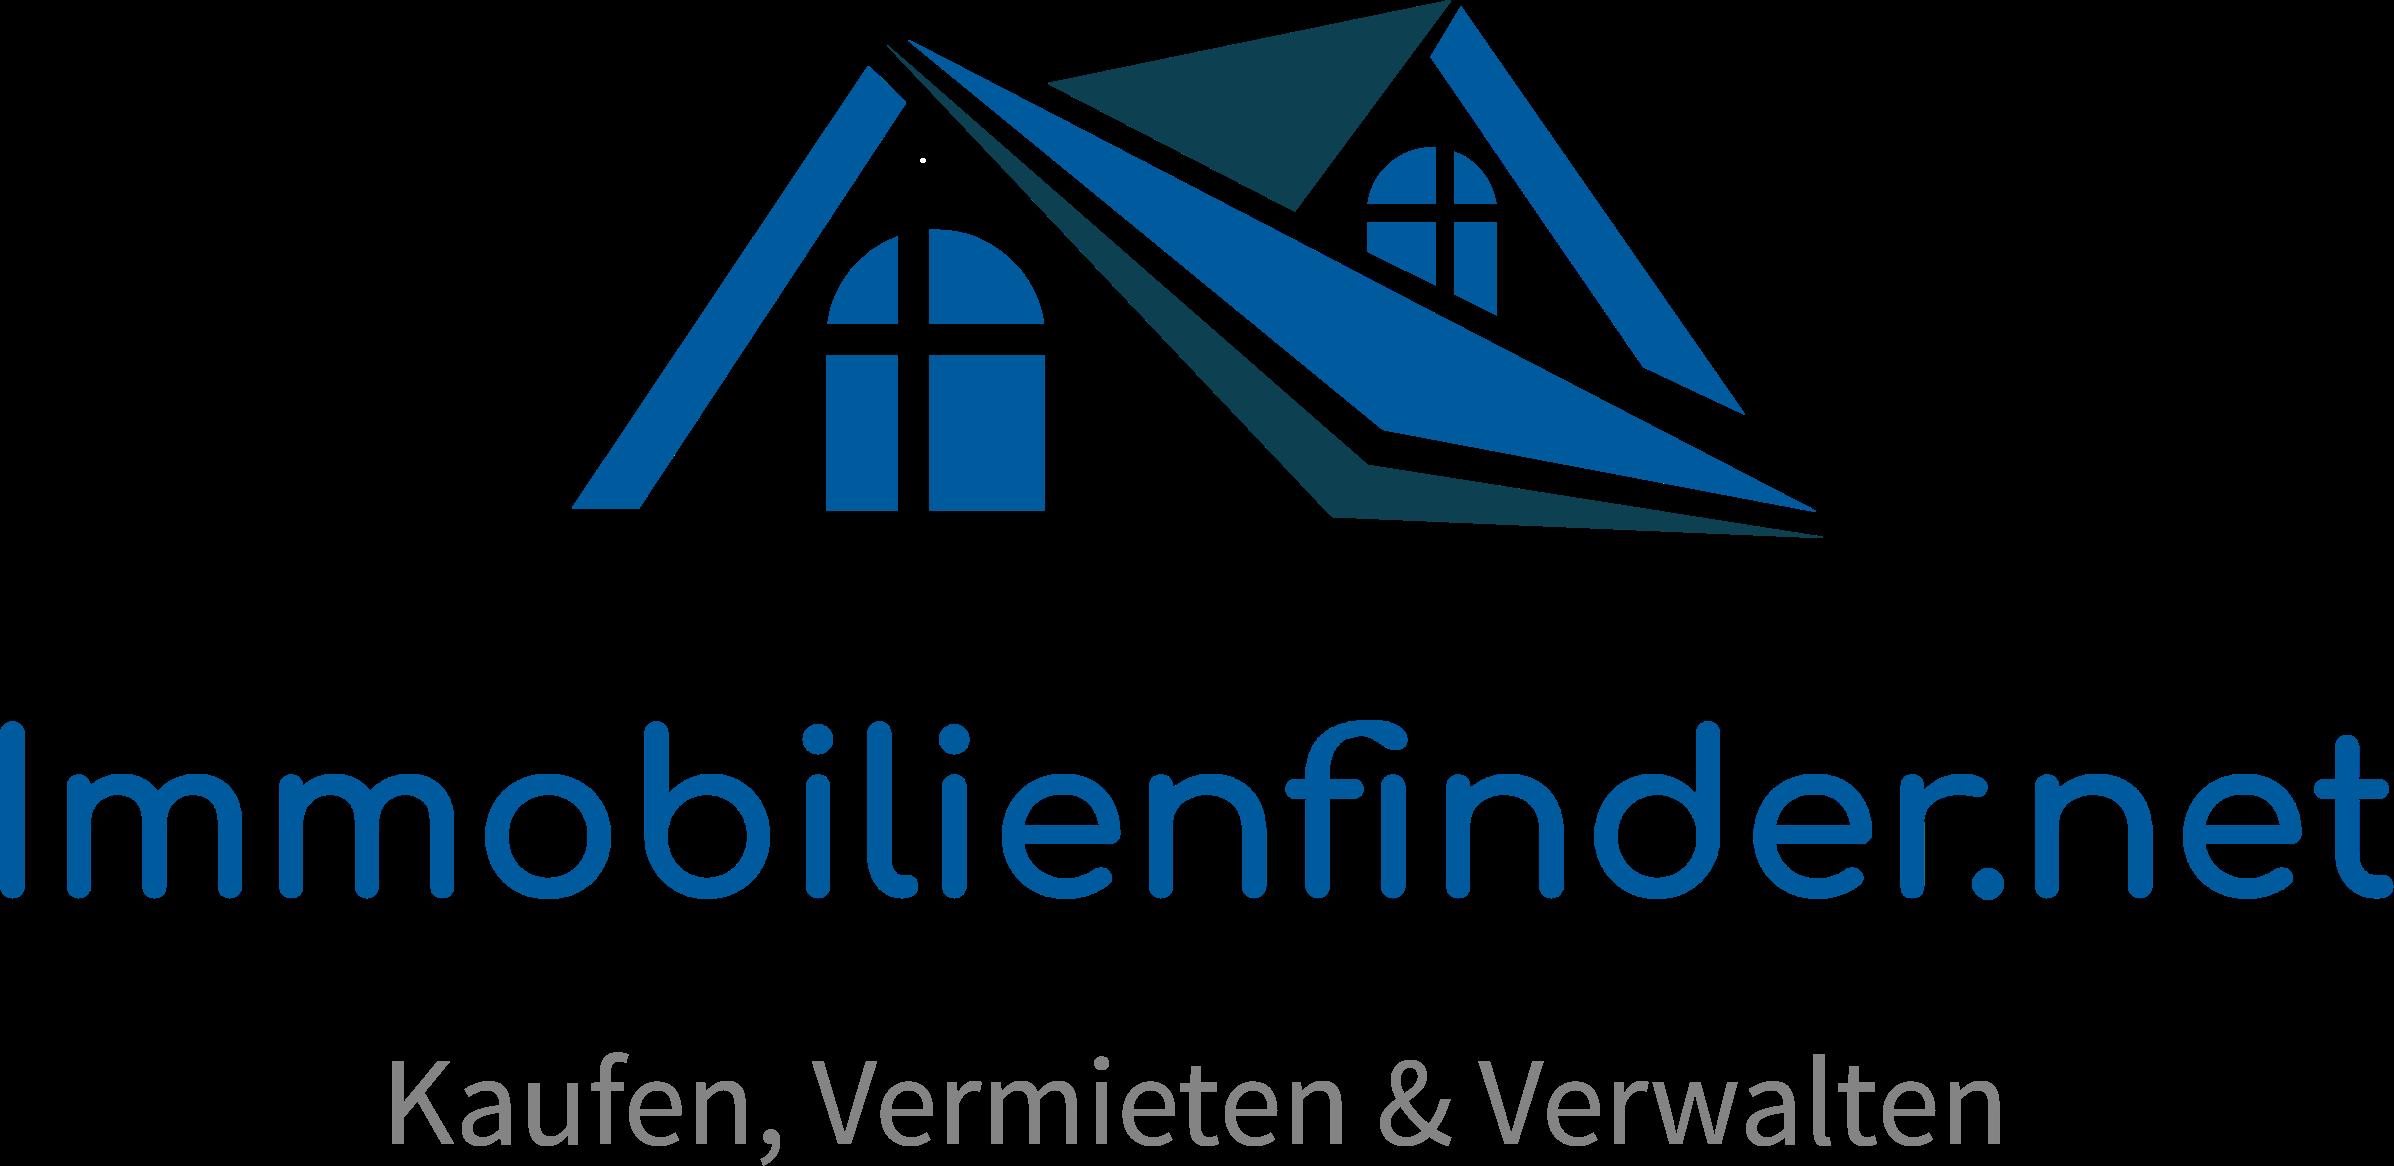 Immobilienfinder.net